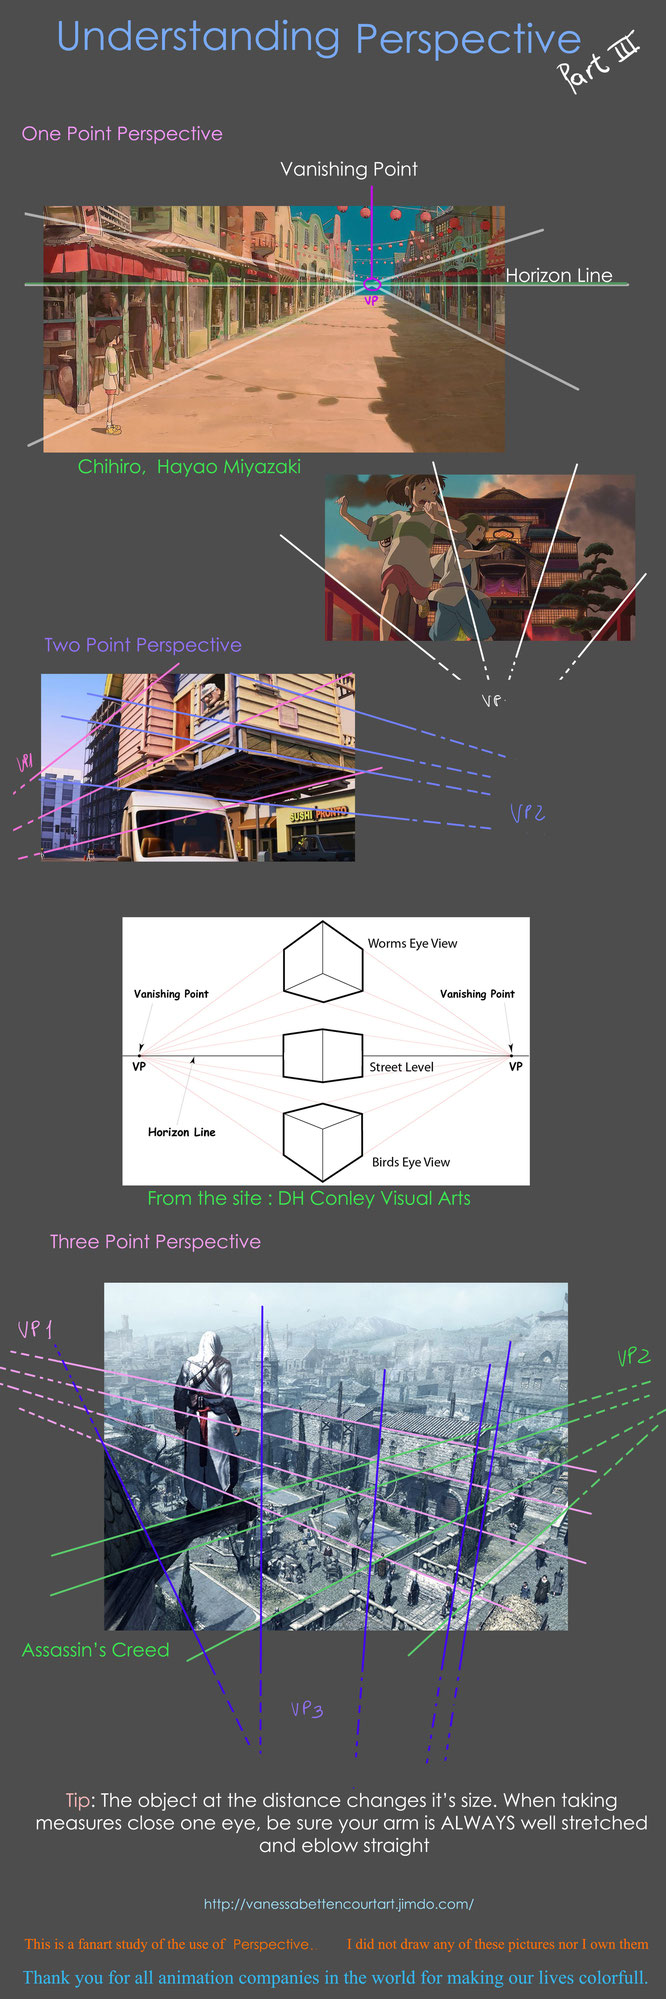 disney pixar tutorial animation perspective studioghibli